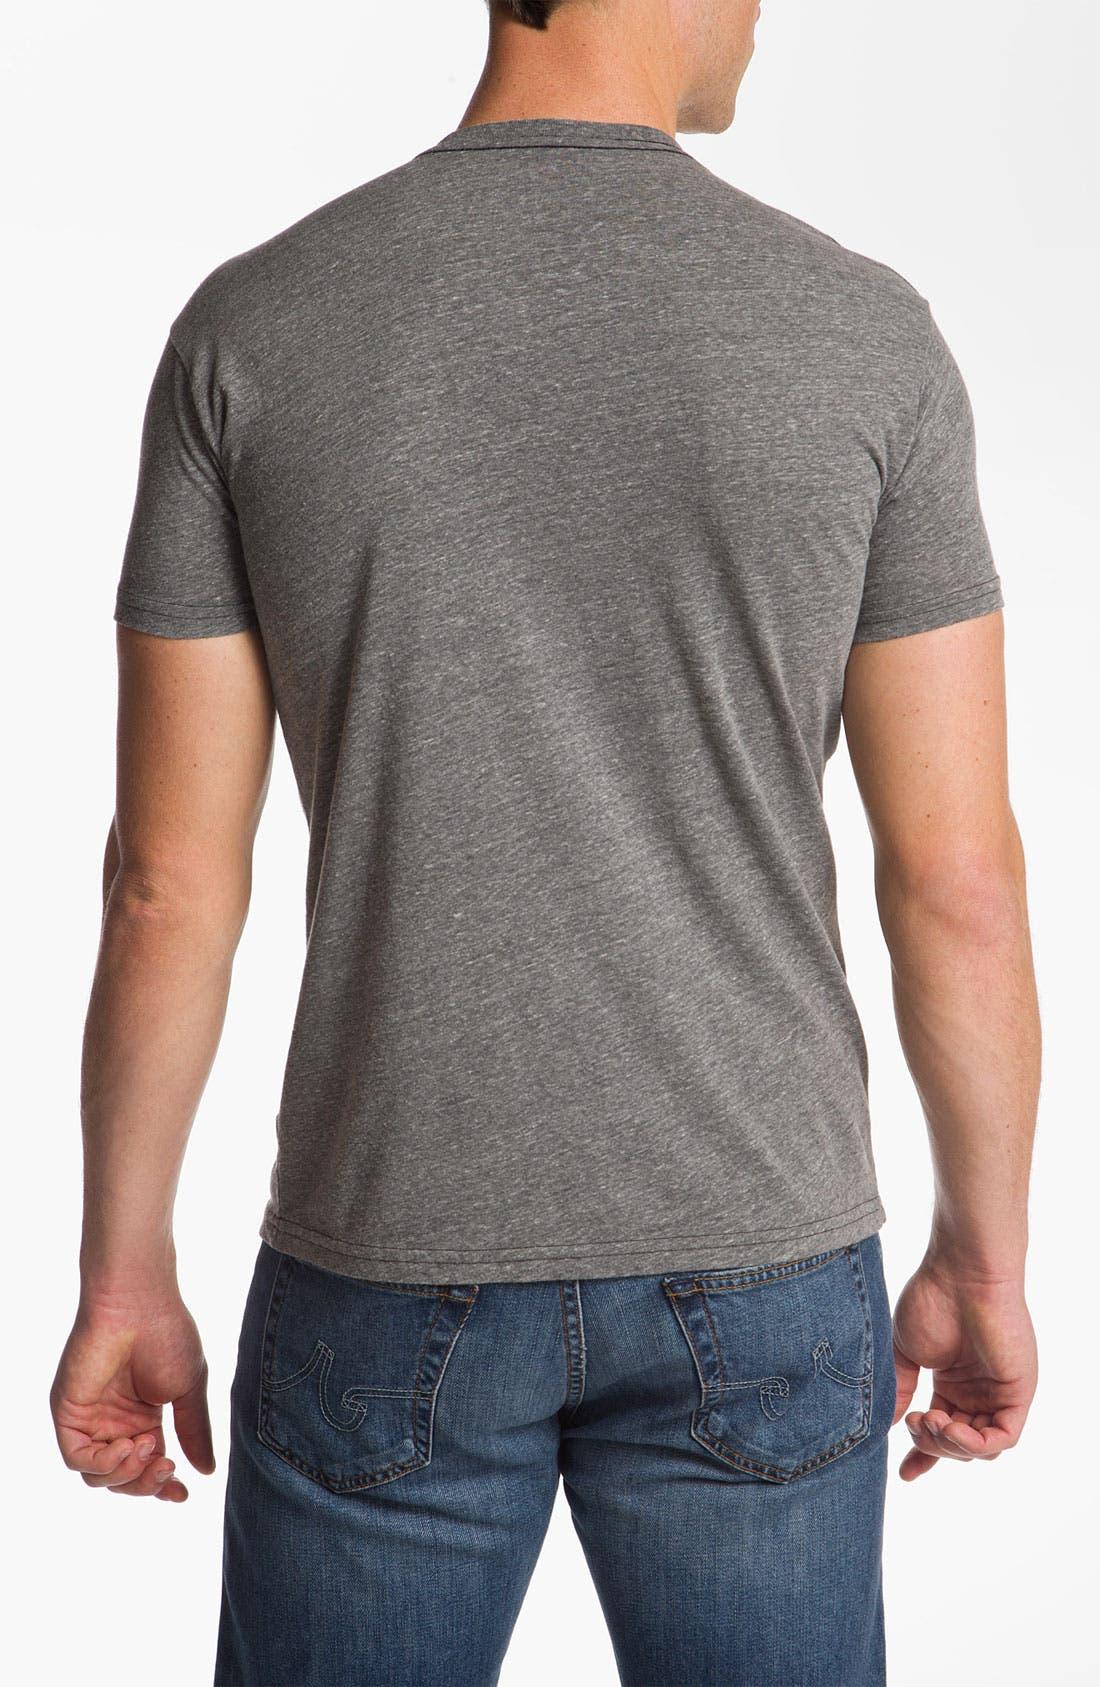 Alternate Image 2  - The Original Retro Brand 'Houston Cougars' T-Shirt